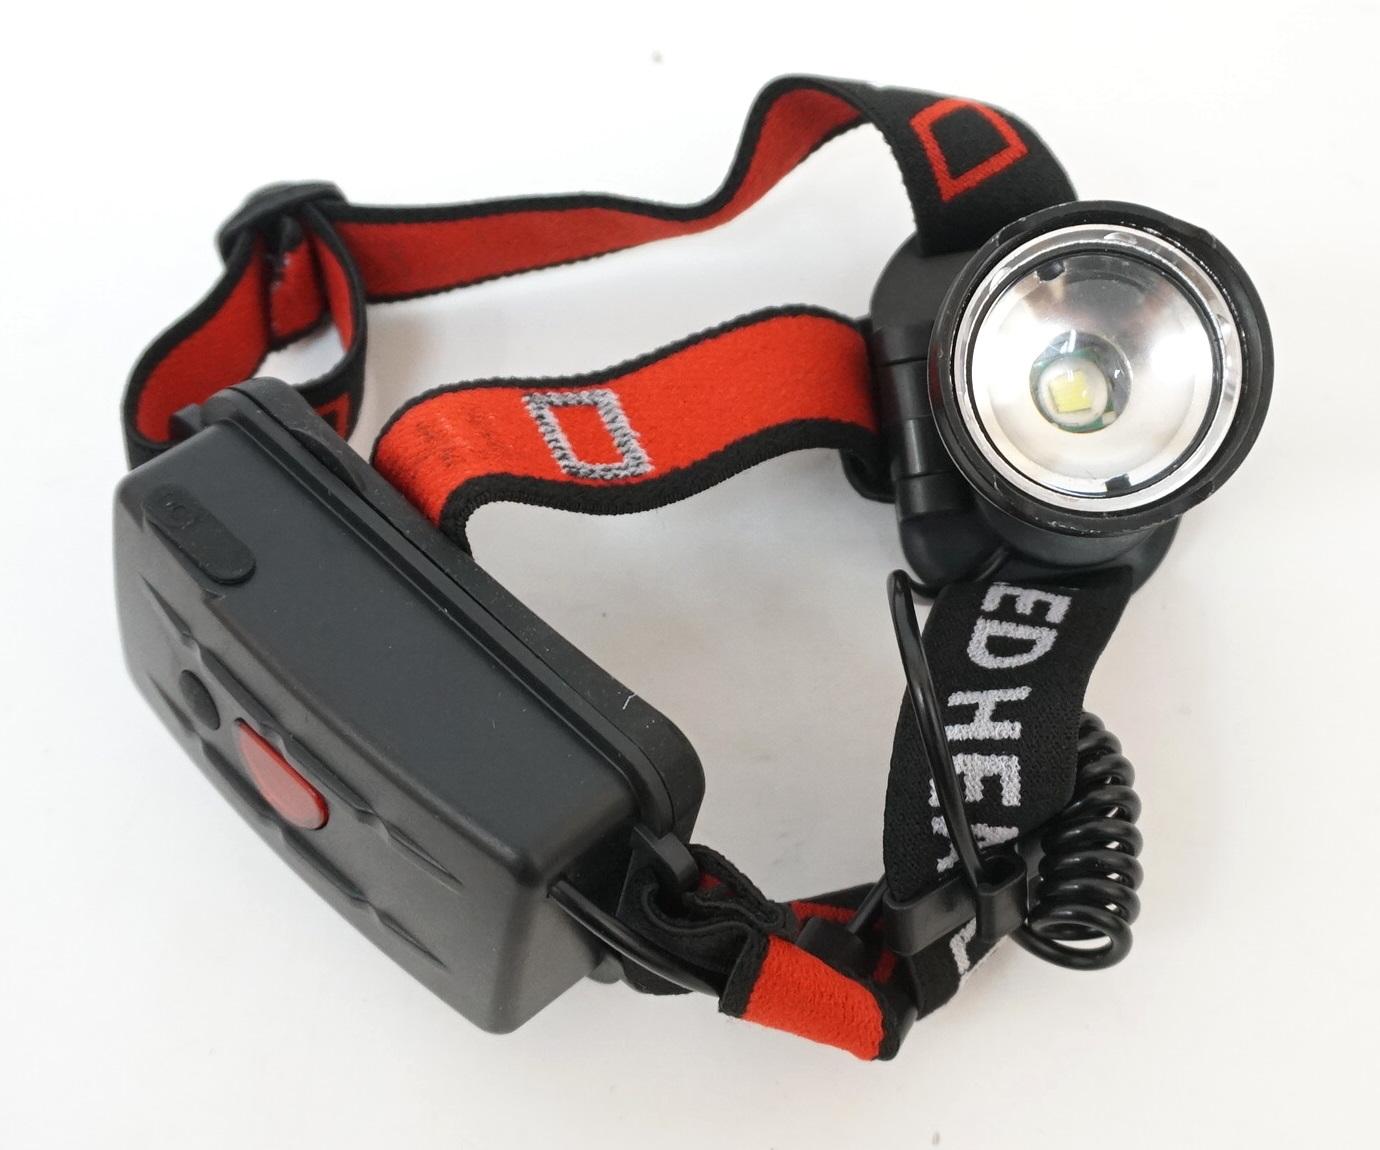 Аккумуляторный налобный фонарь FL070, 3 режима, зум